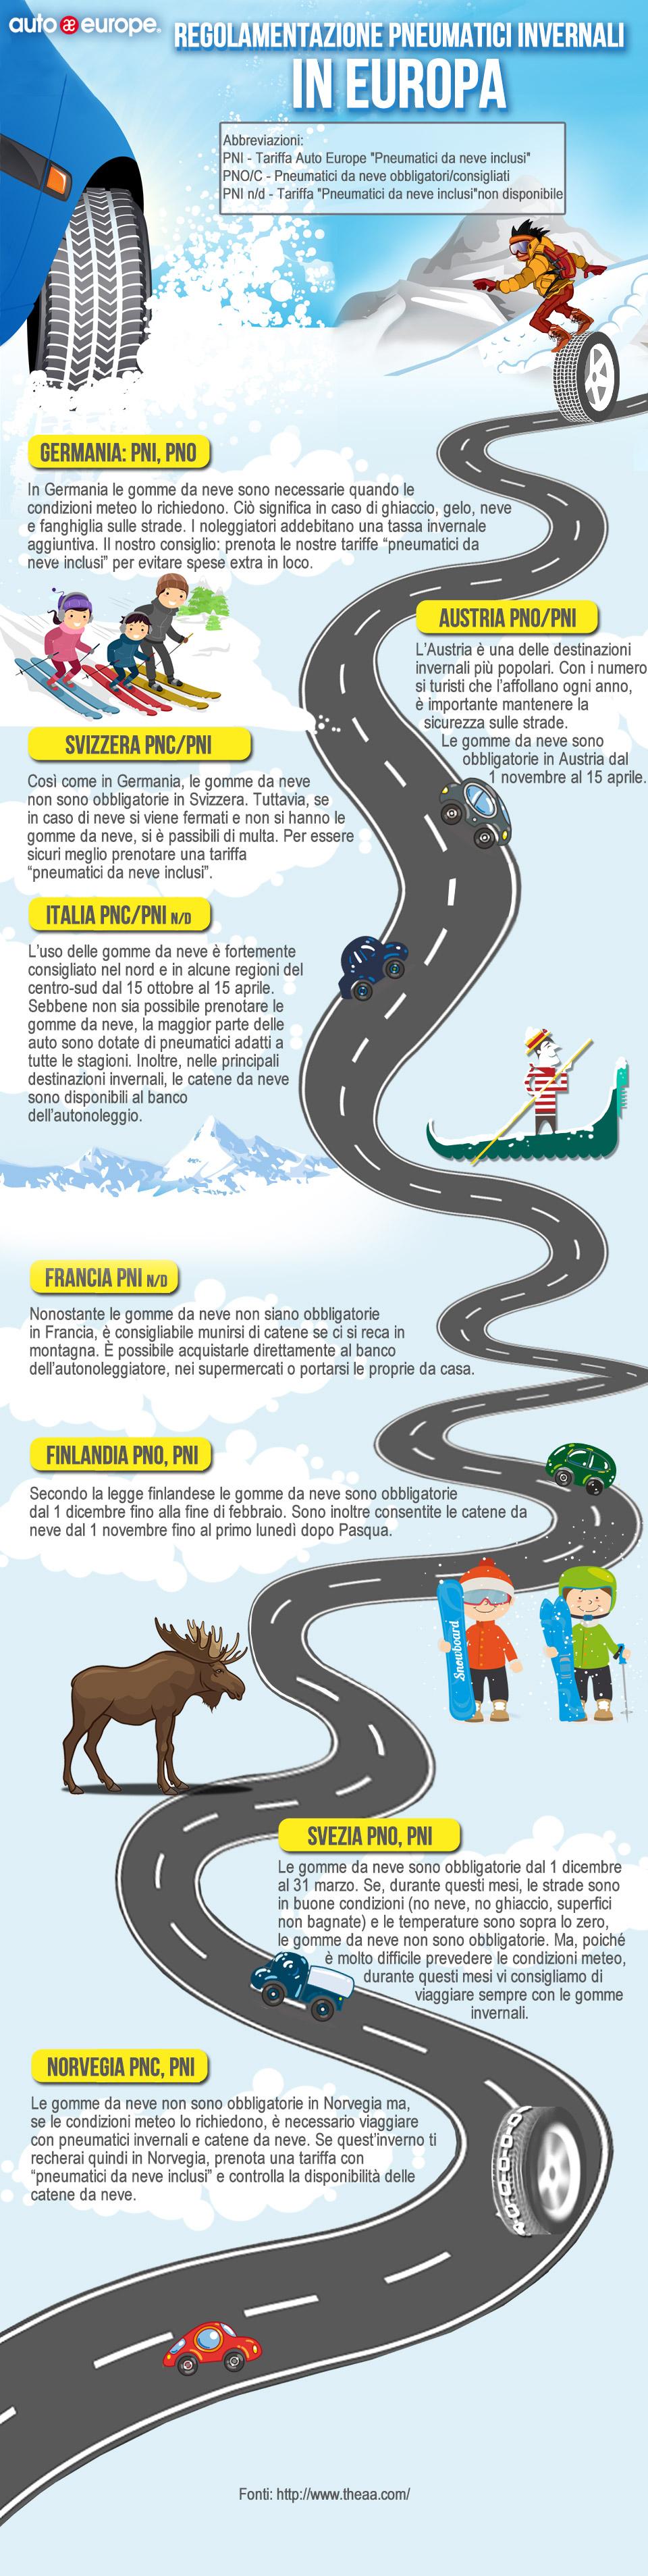 Auto Europe - uso pneumatici invernali in Europa